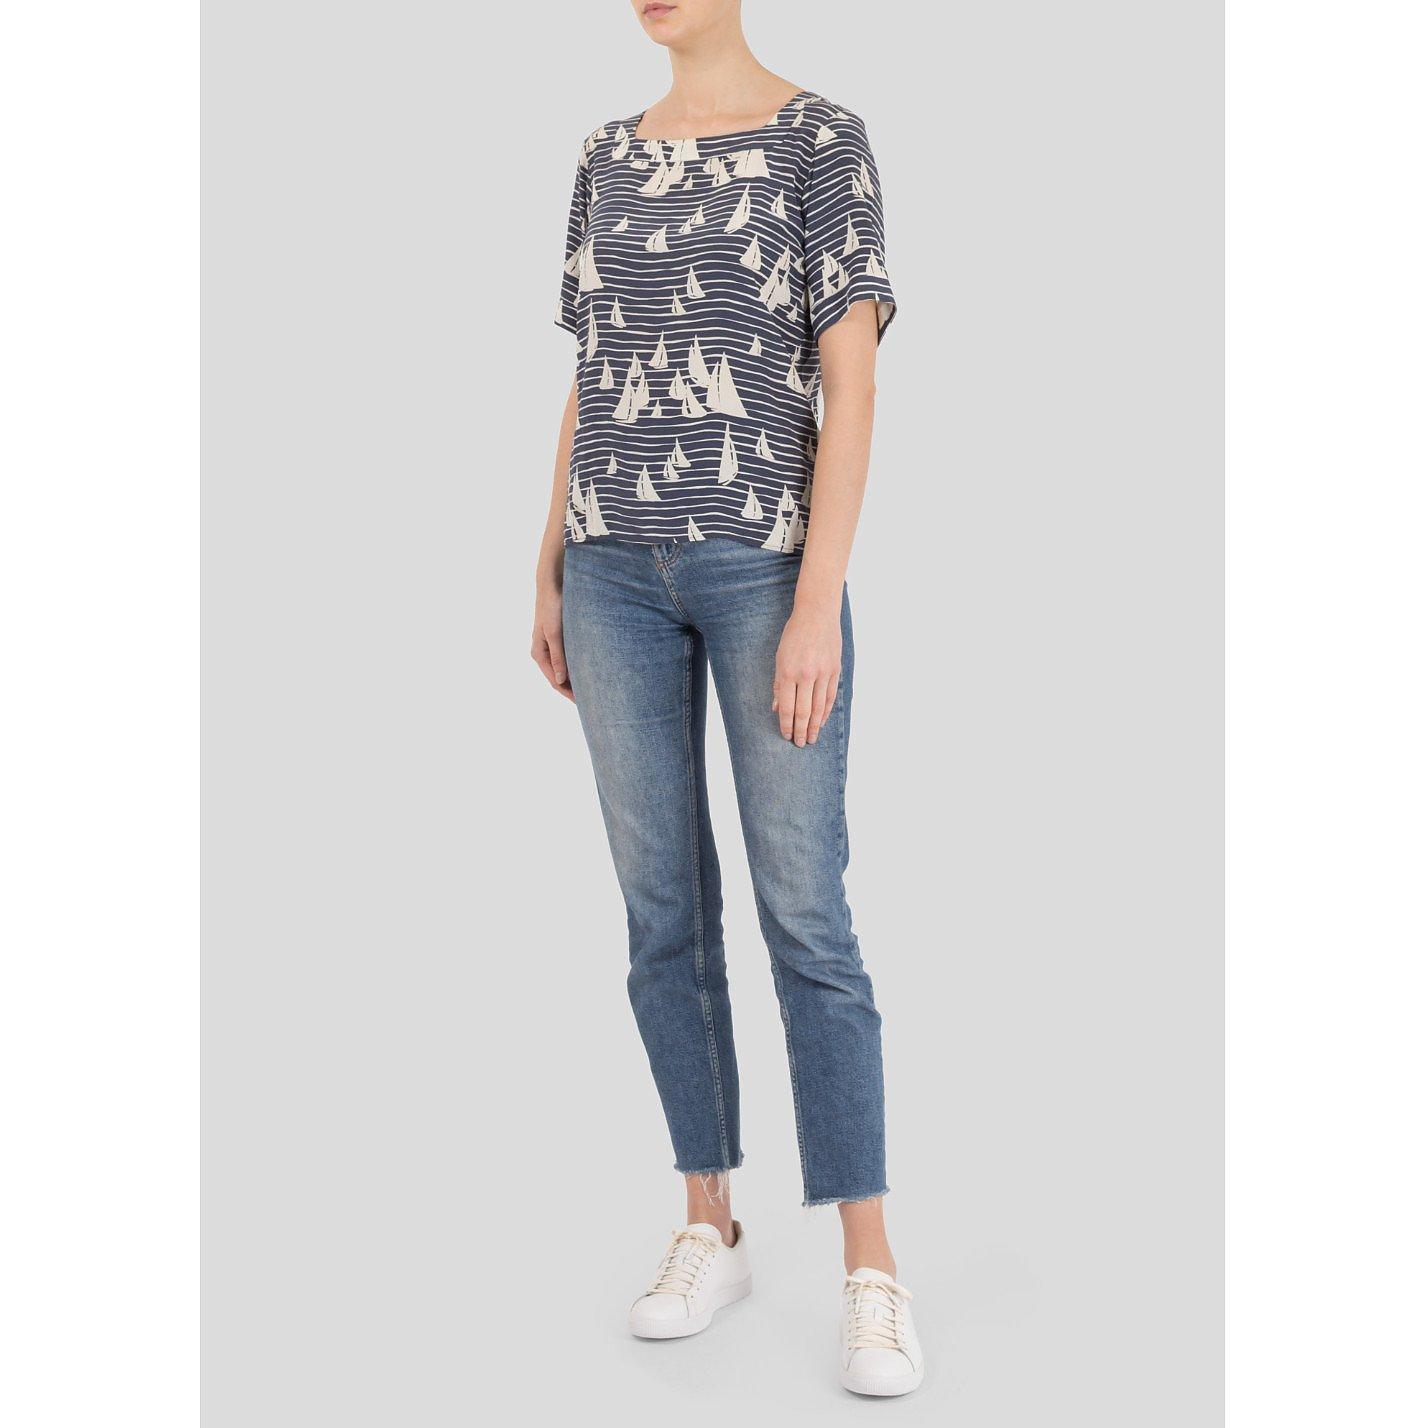 Yves Saint Laurent Printed Silk Shirt